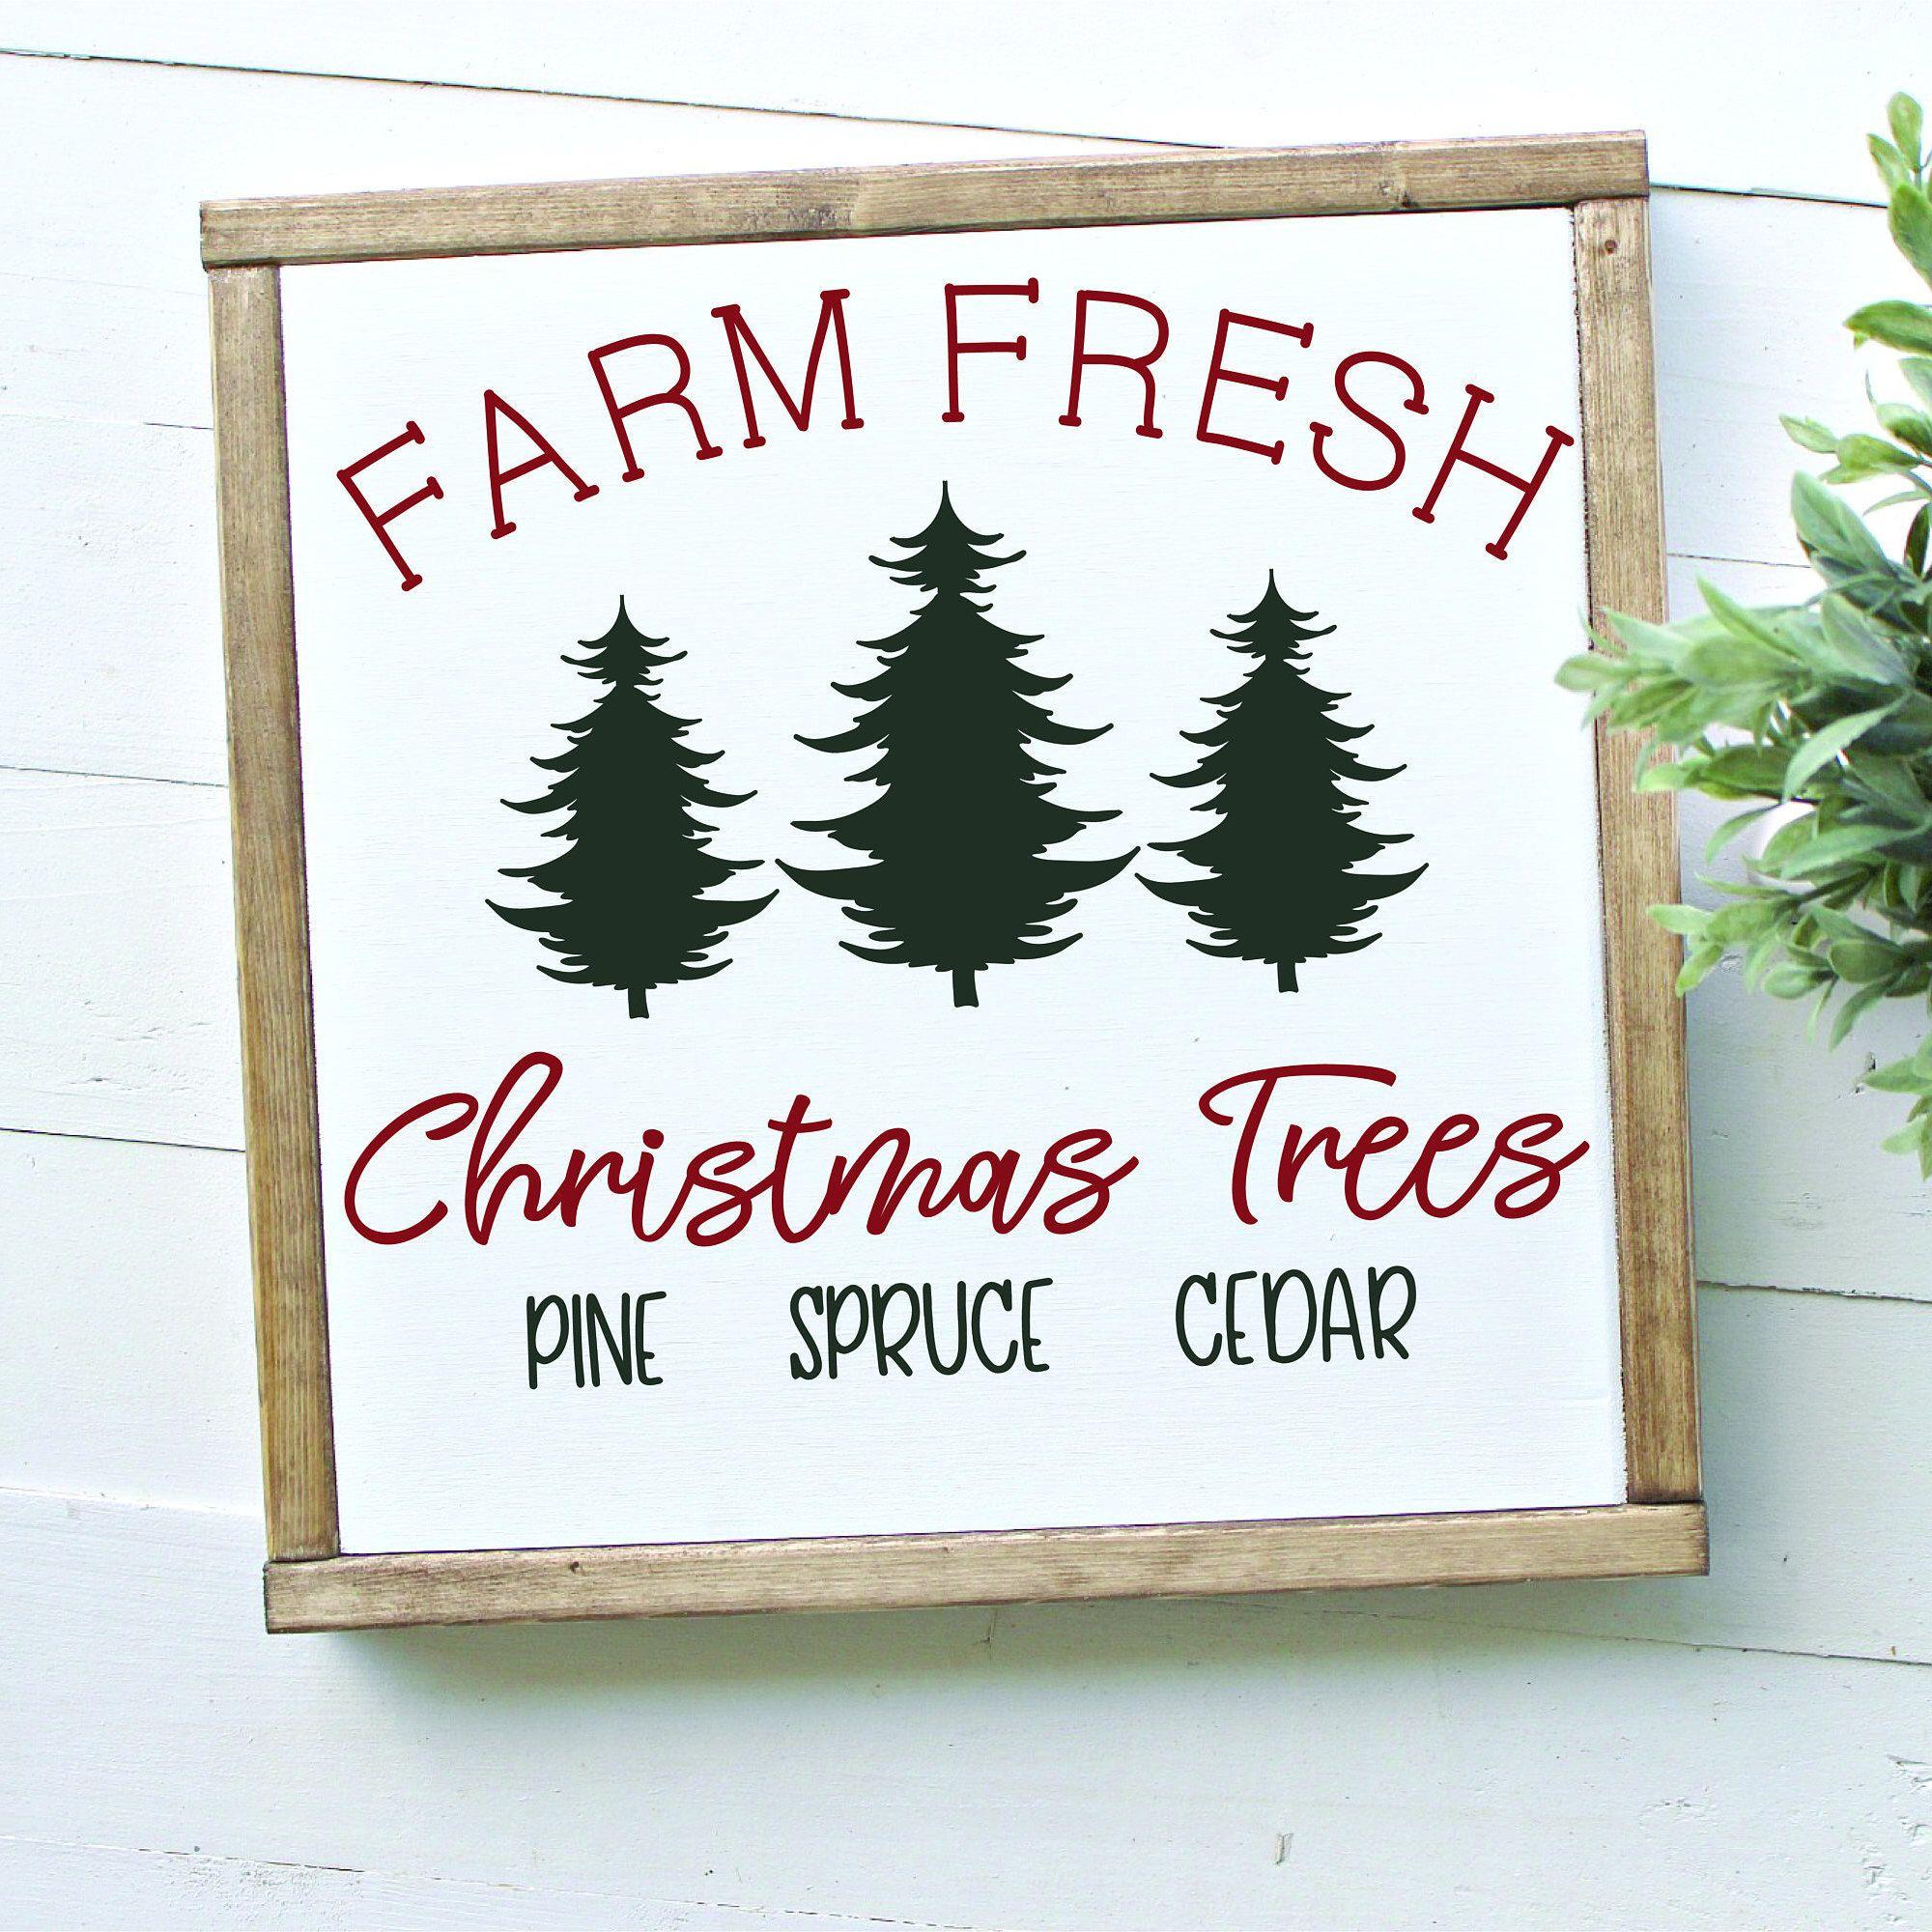 Farm Fresh Christmas Trees SVG by RosemaryDesignsLLC on